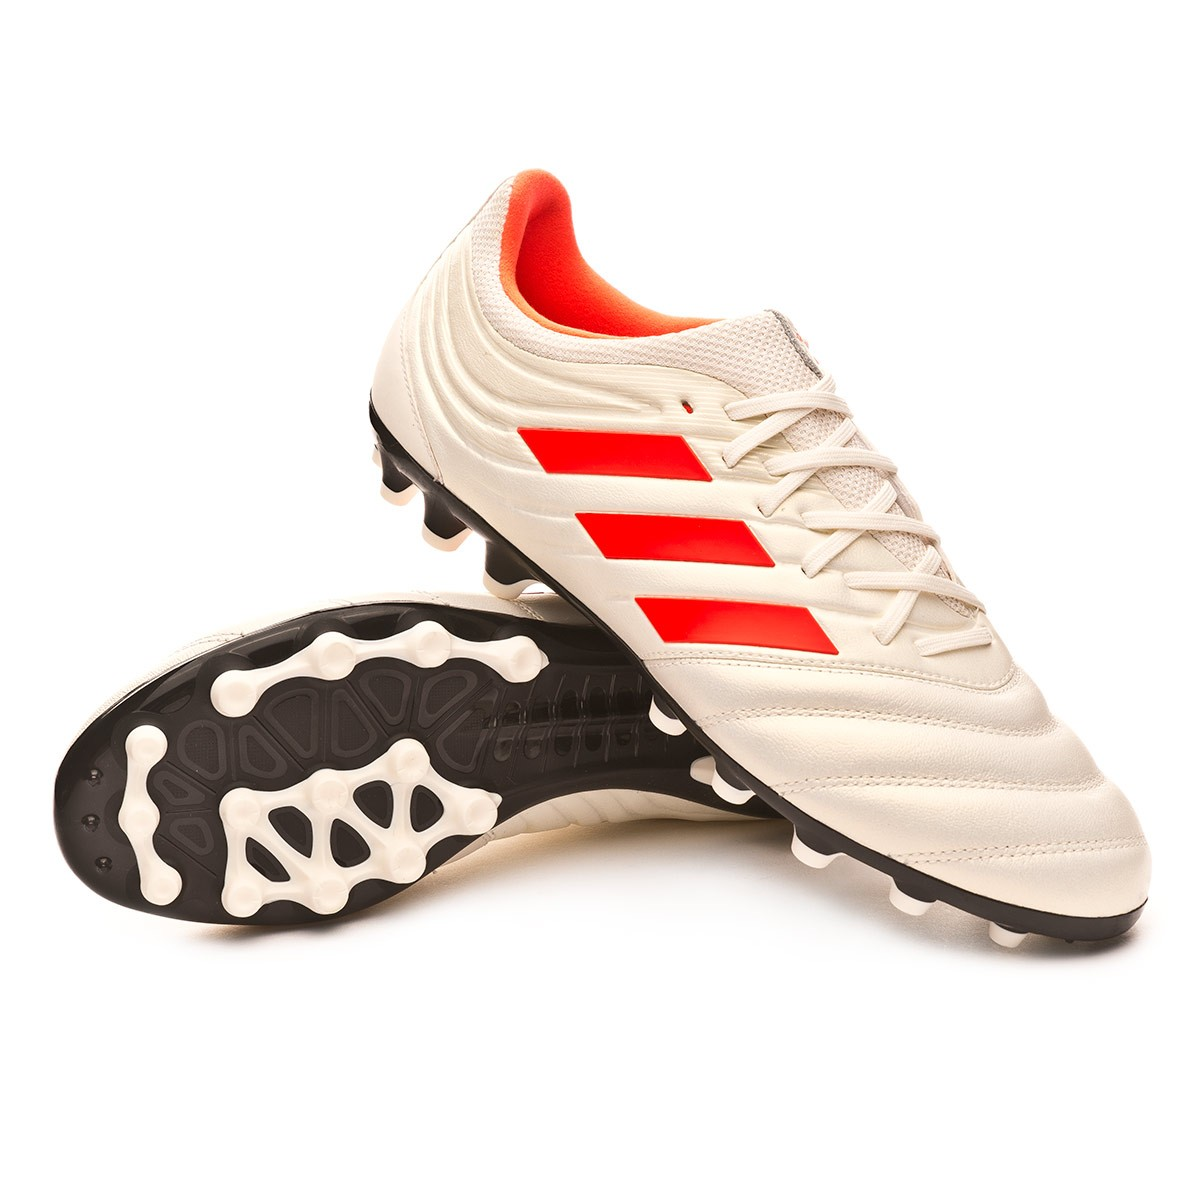 Scarpe adidas Copa 19.3 AG